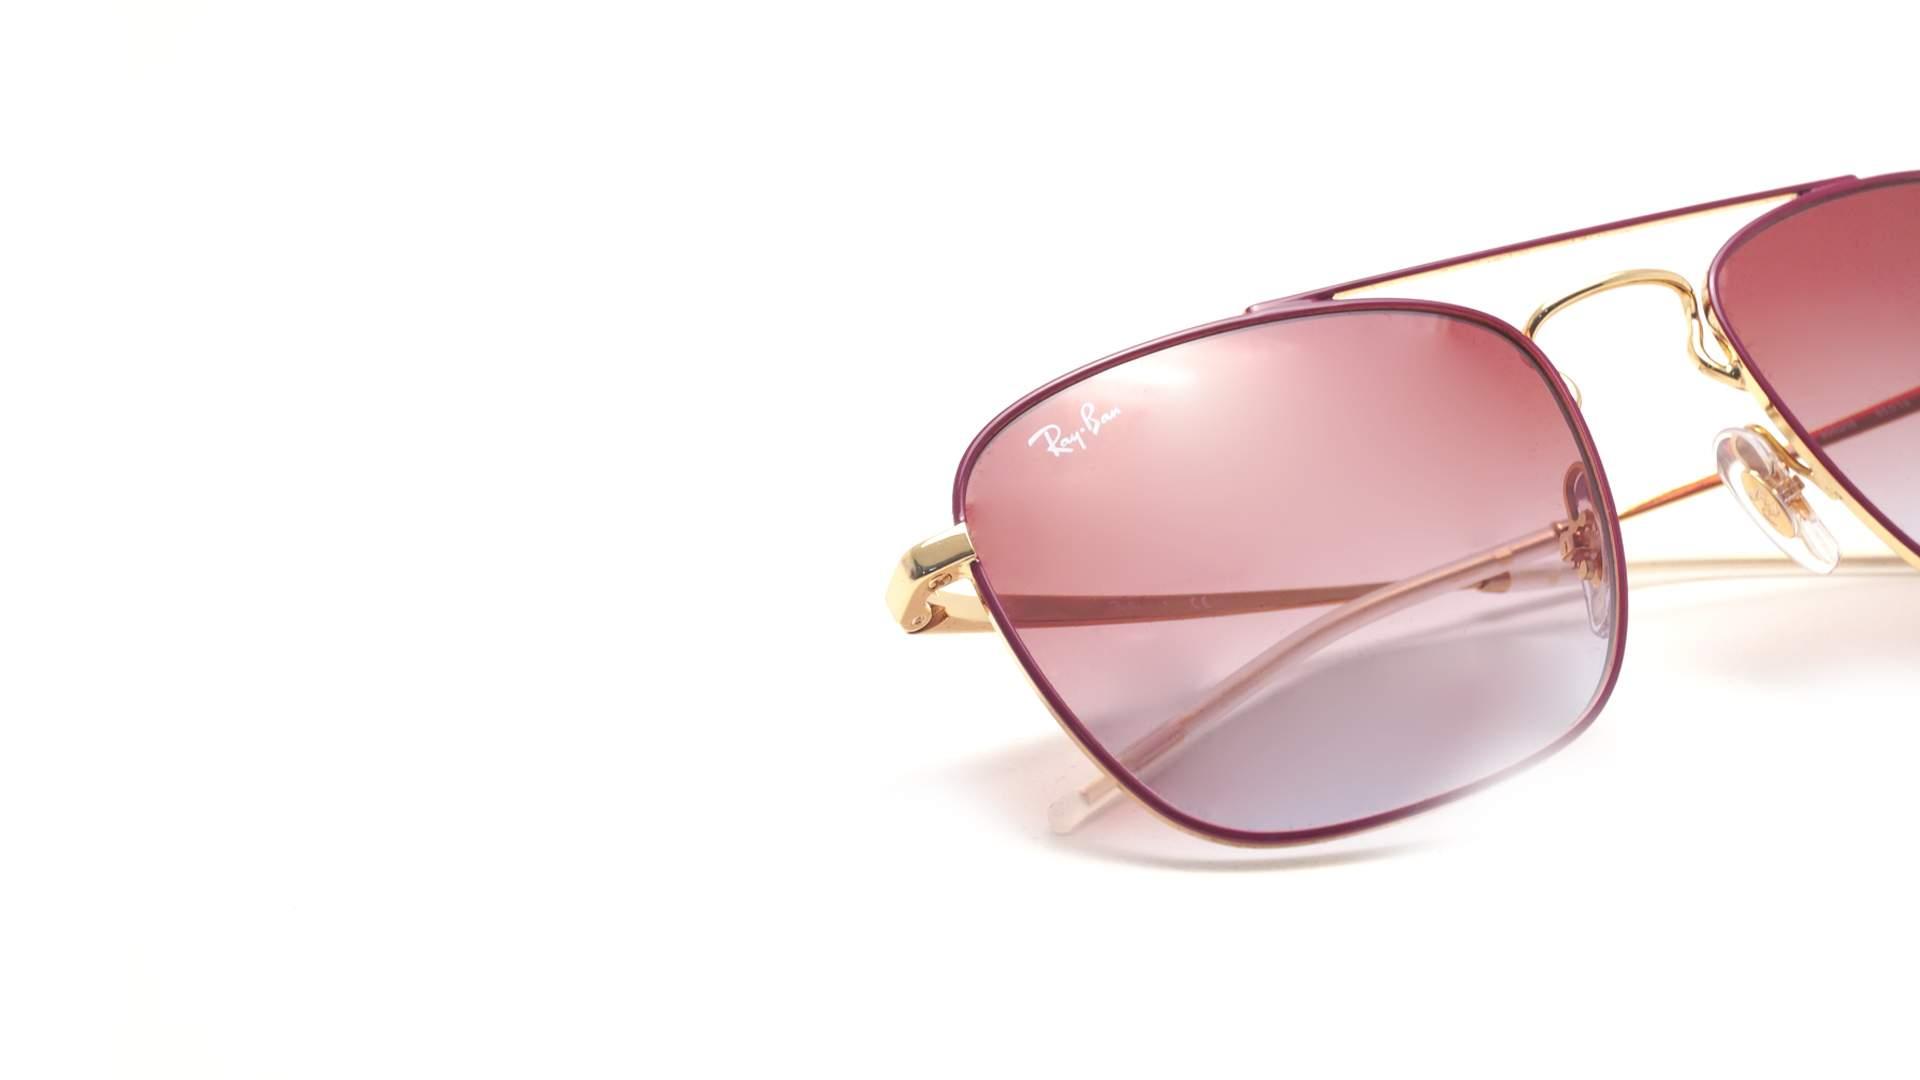 a48763519c Sunglasses Ray-Ban RB3588 9060 I8 55-19 Pink Medium Gradient